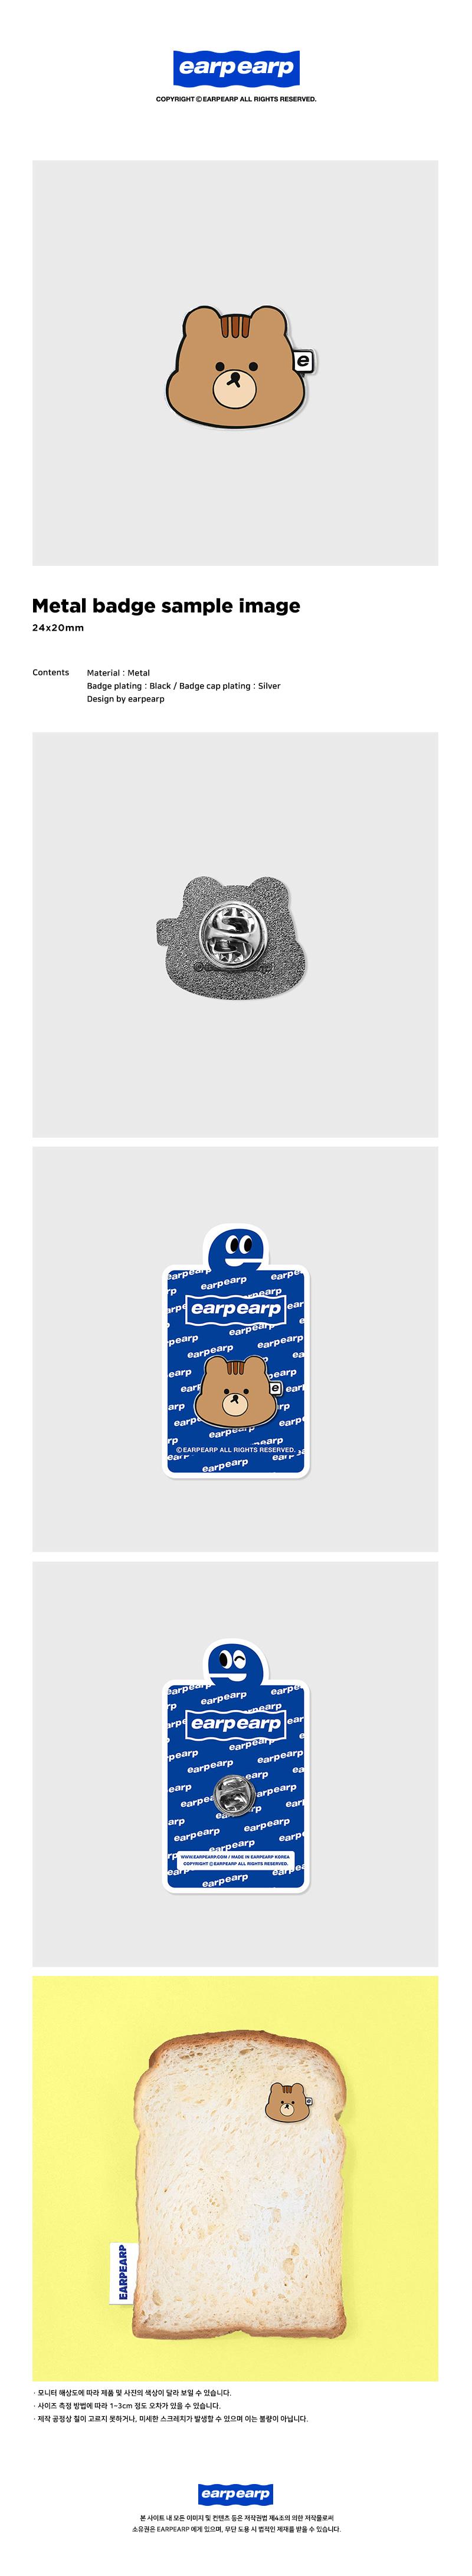 Squirrel(뱃지) 6,900원-어프어프패션잡화, 패션소품, 브로치/뱃지, 뱃지바보사랑 Squirrel(뱃지) 6,900원-어프어프패션잡화, 패션소품, 브로치/뱃지, 뱃지바보사랑